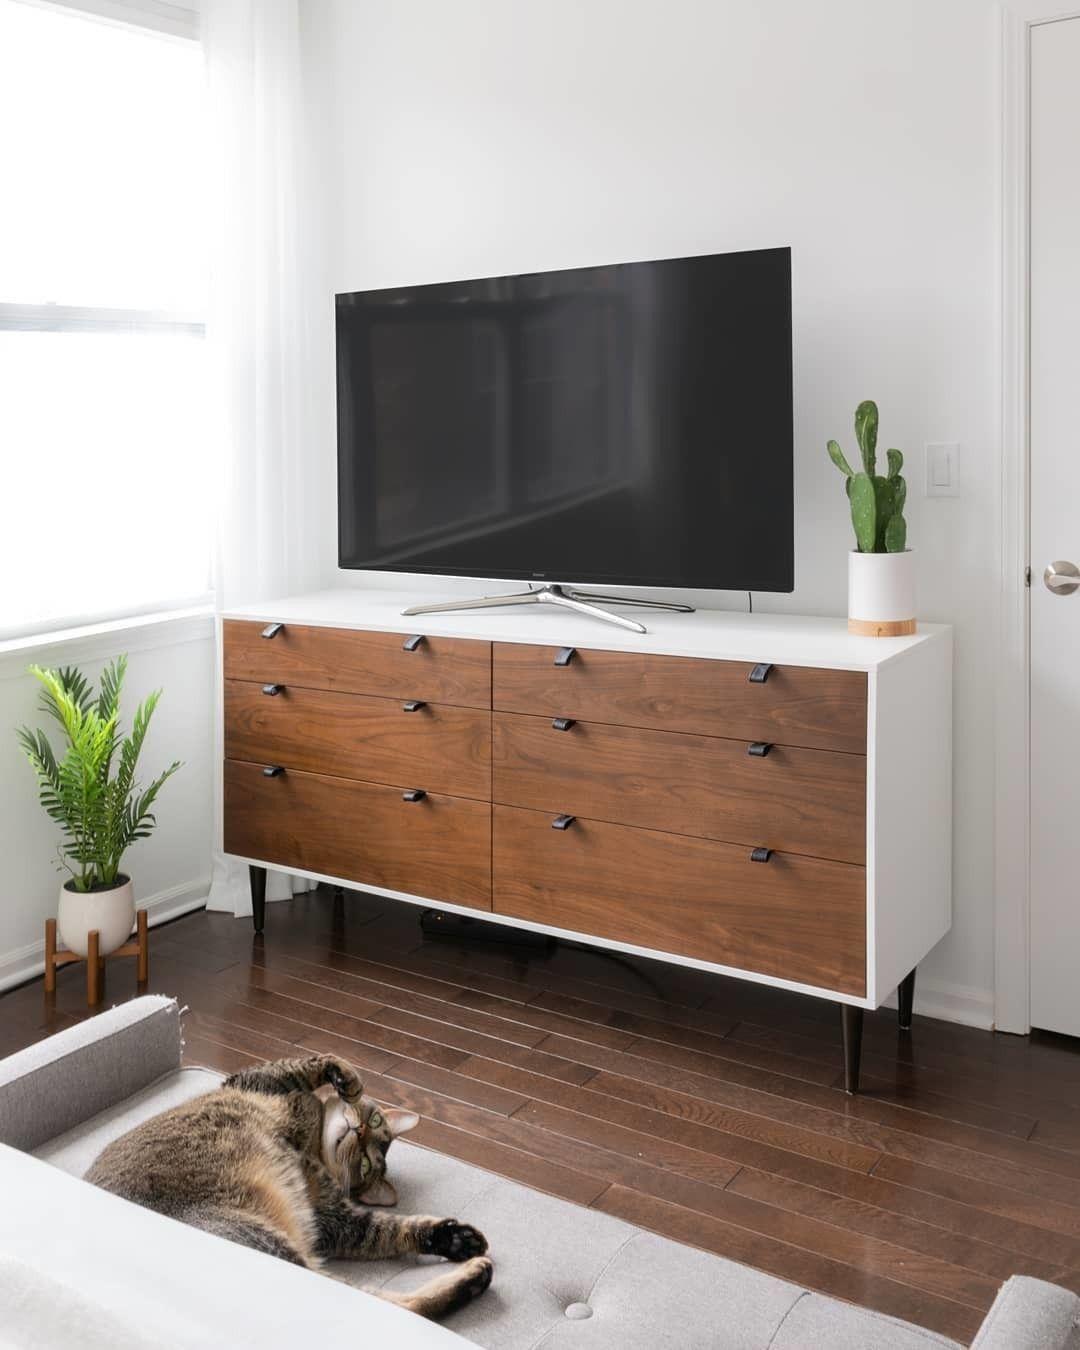 Envelo White Walnut 6 Drawer Double Dresser White Furniture Bedroom Modern Modern Bedroom Dressers Furniture [ 1350 x 1080 Pixel ]